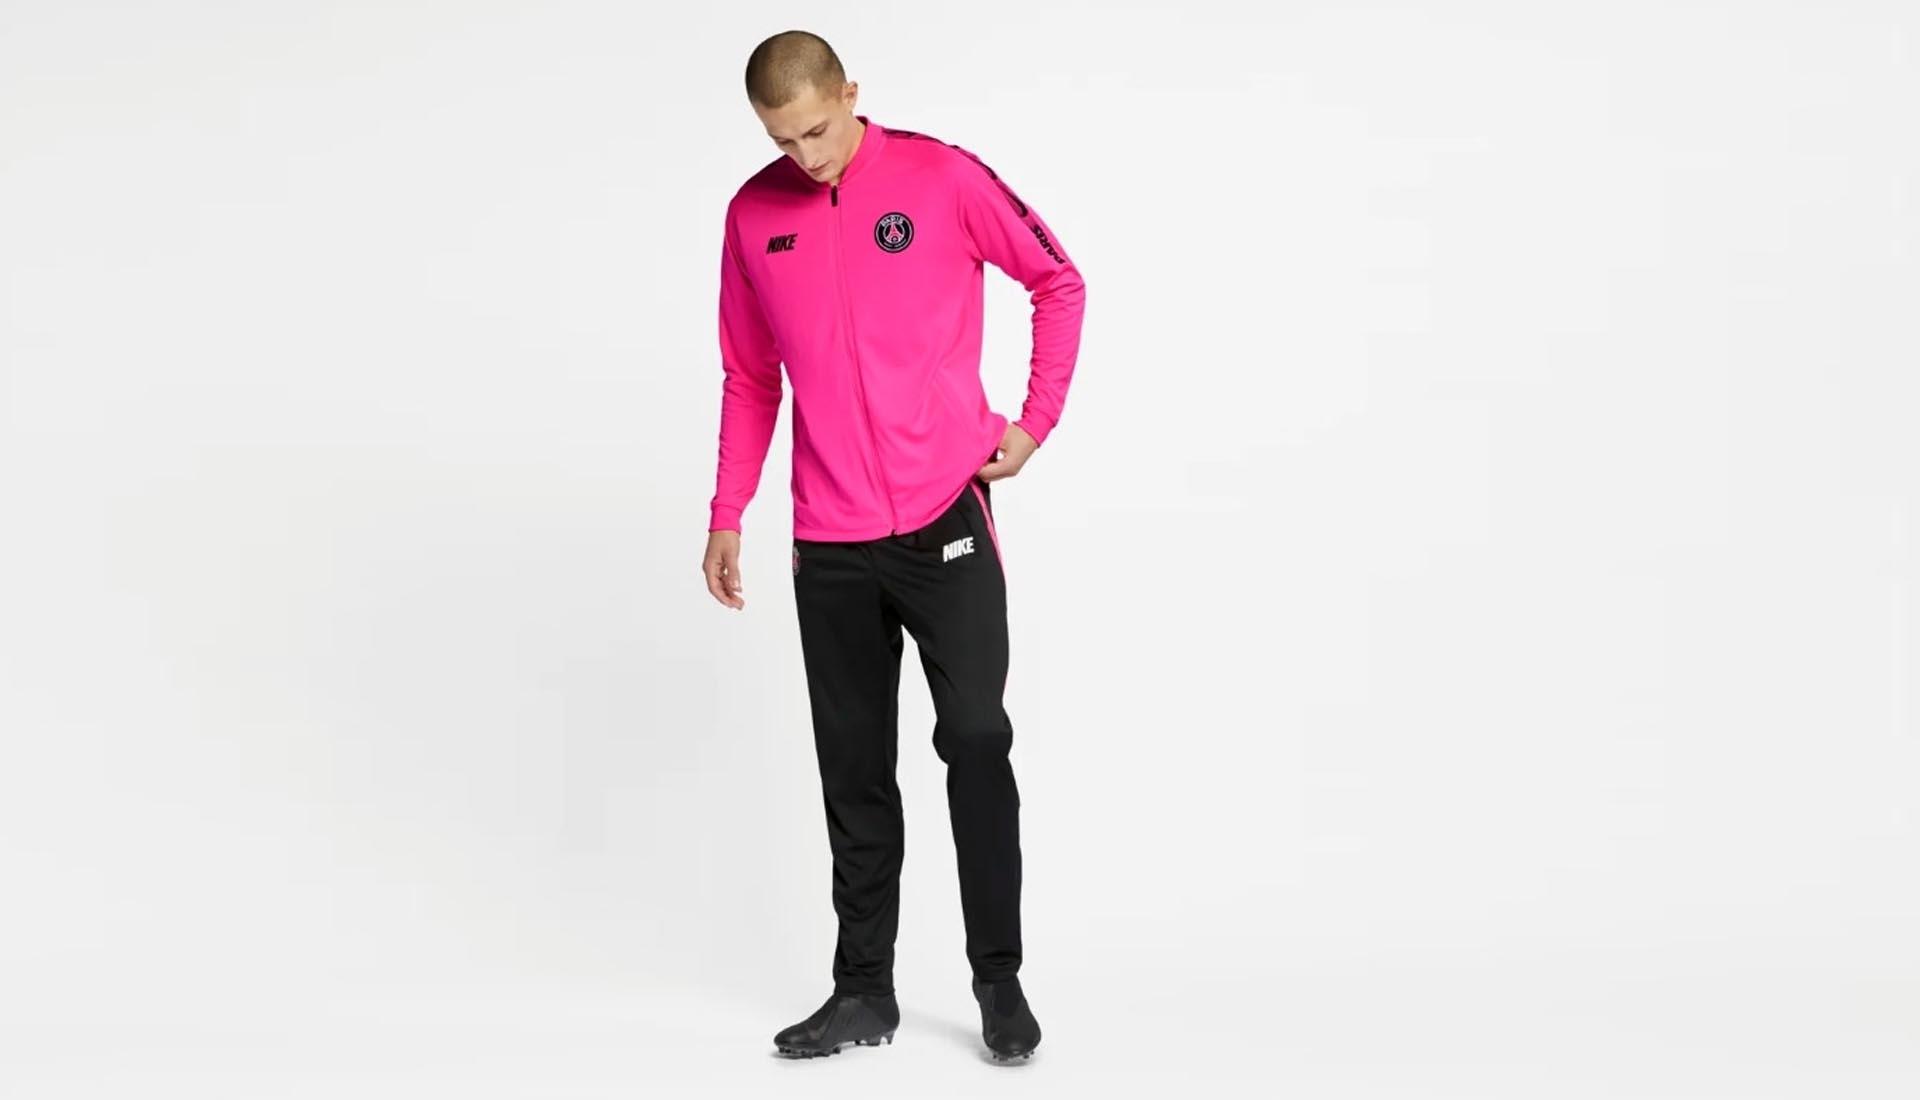 Variedad Ópera editorial  PSG & Nike Drop Pink 2019 Training Collection - SoccerBible